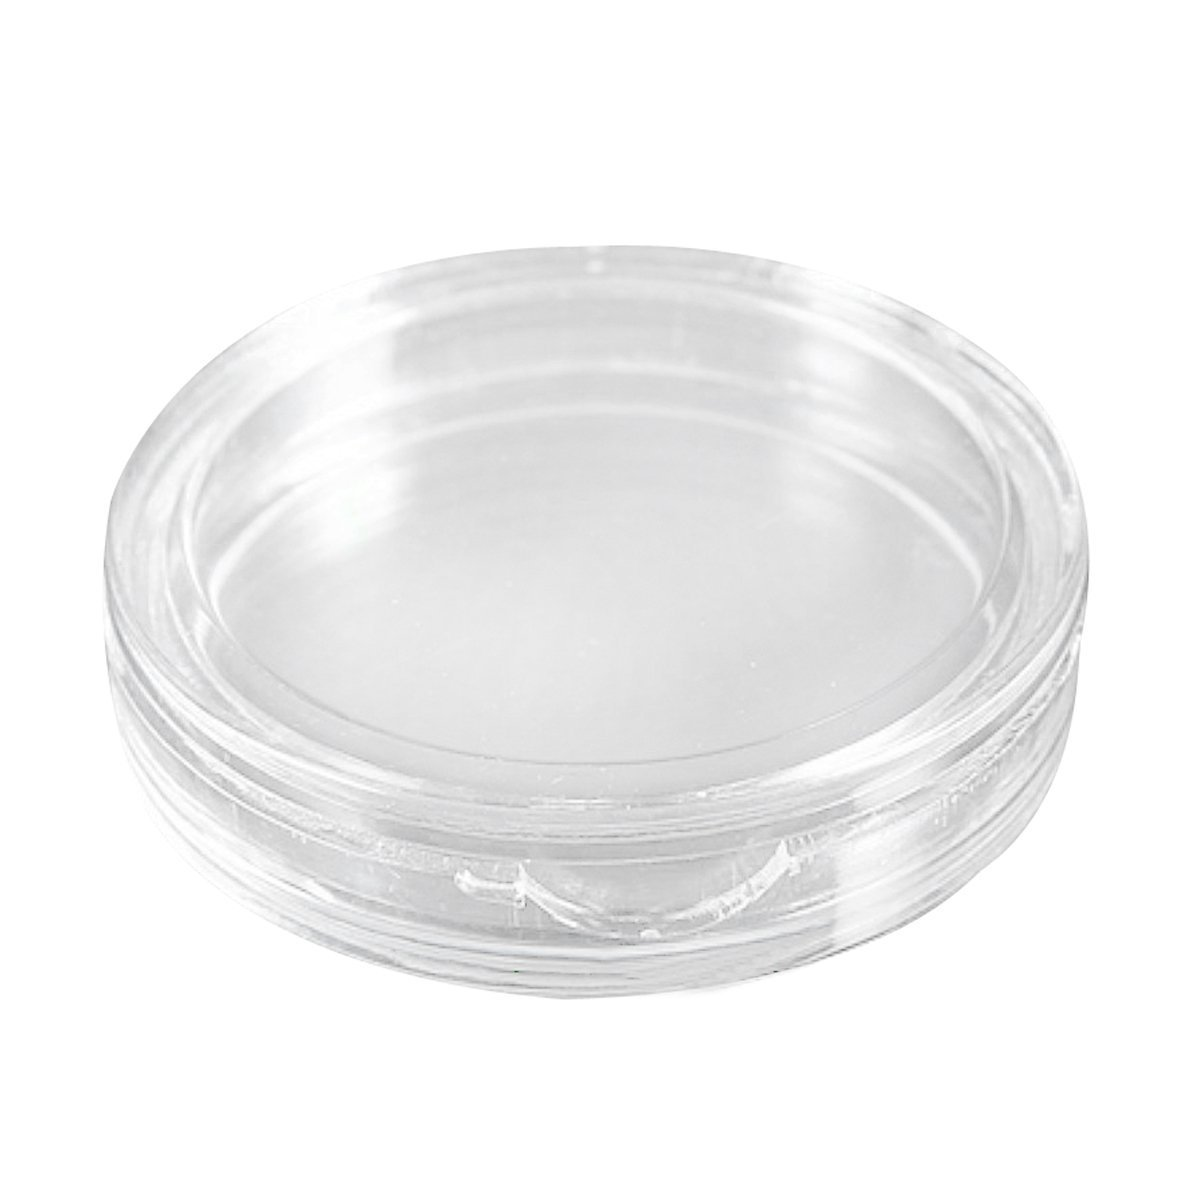 SODIAL(R) 10 pcs Small round transparent plastic coin capsules box 21mm